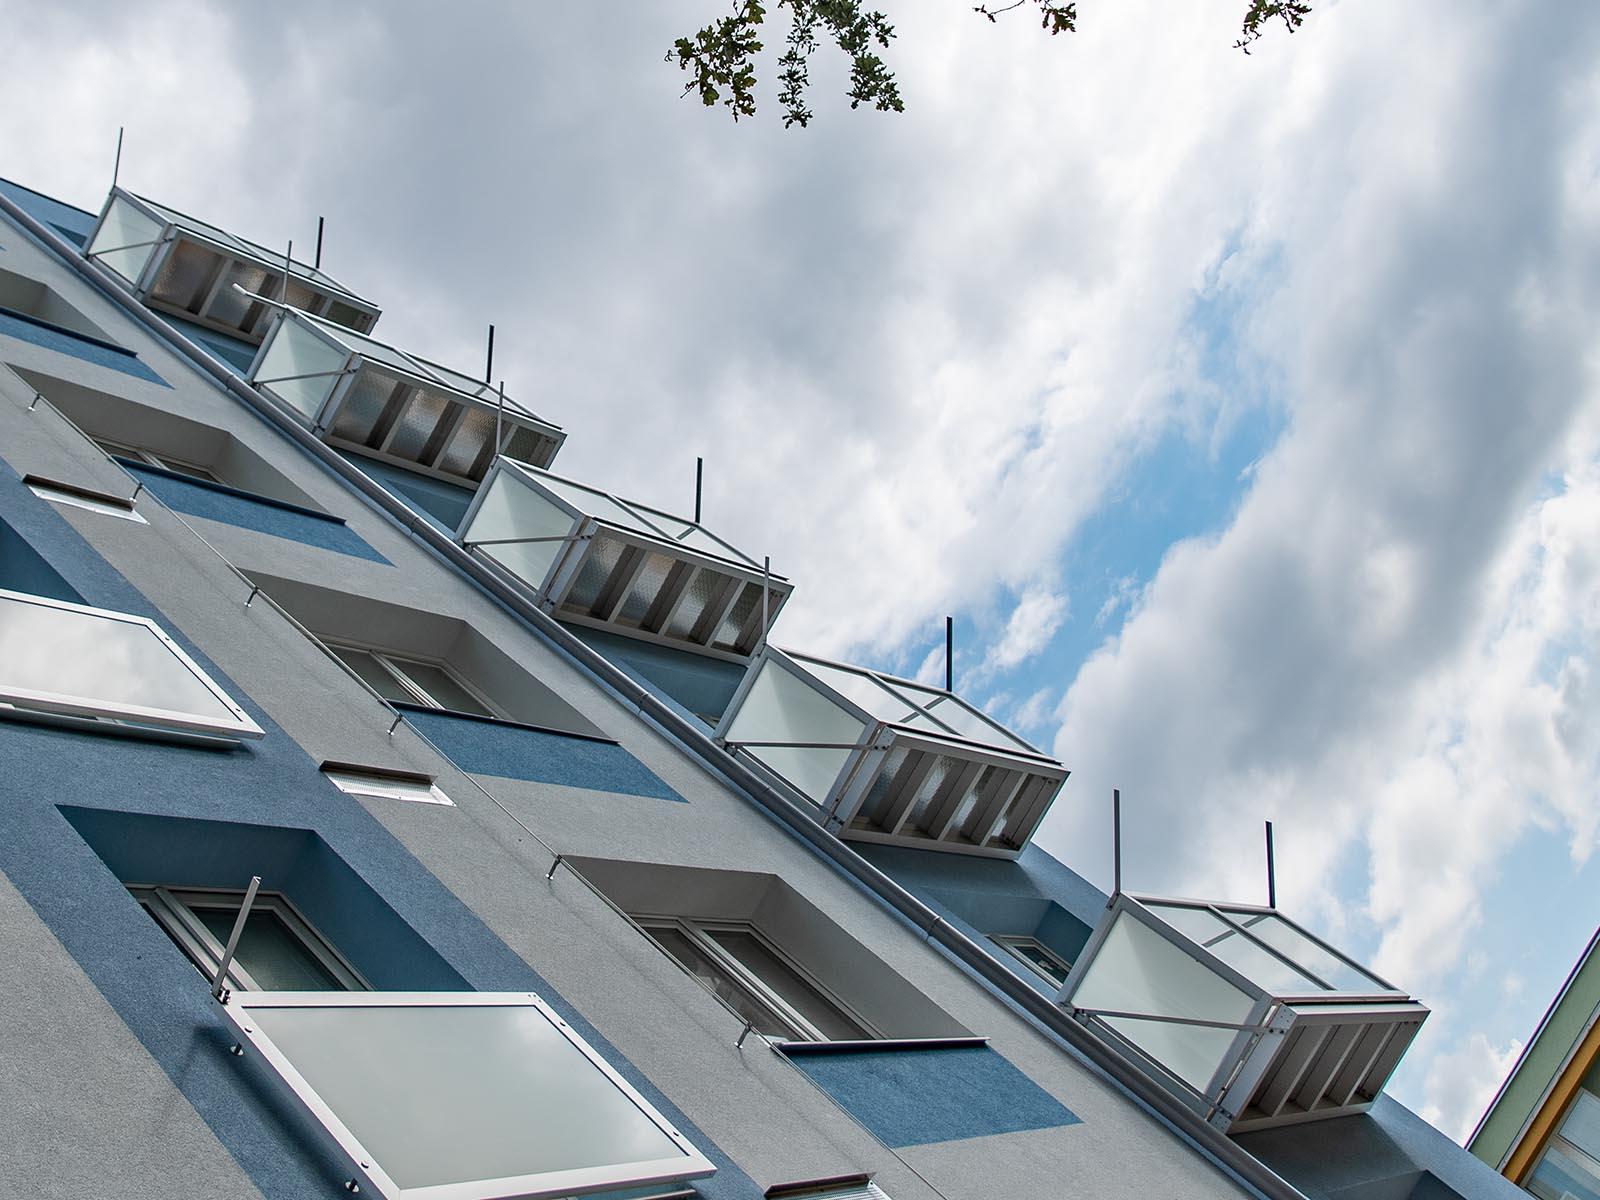 montáž závěsných balkonů Olomouc